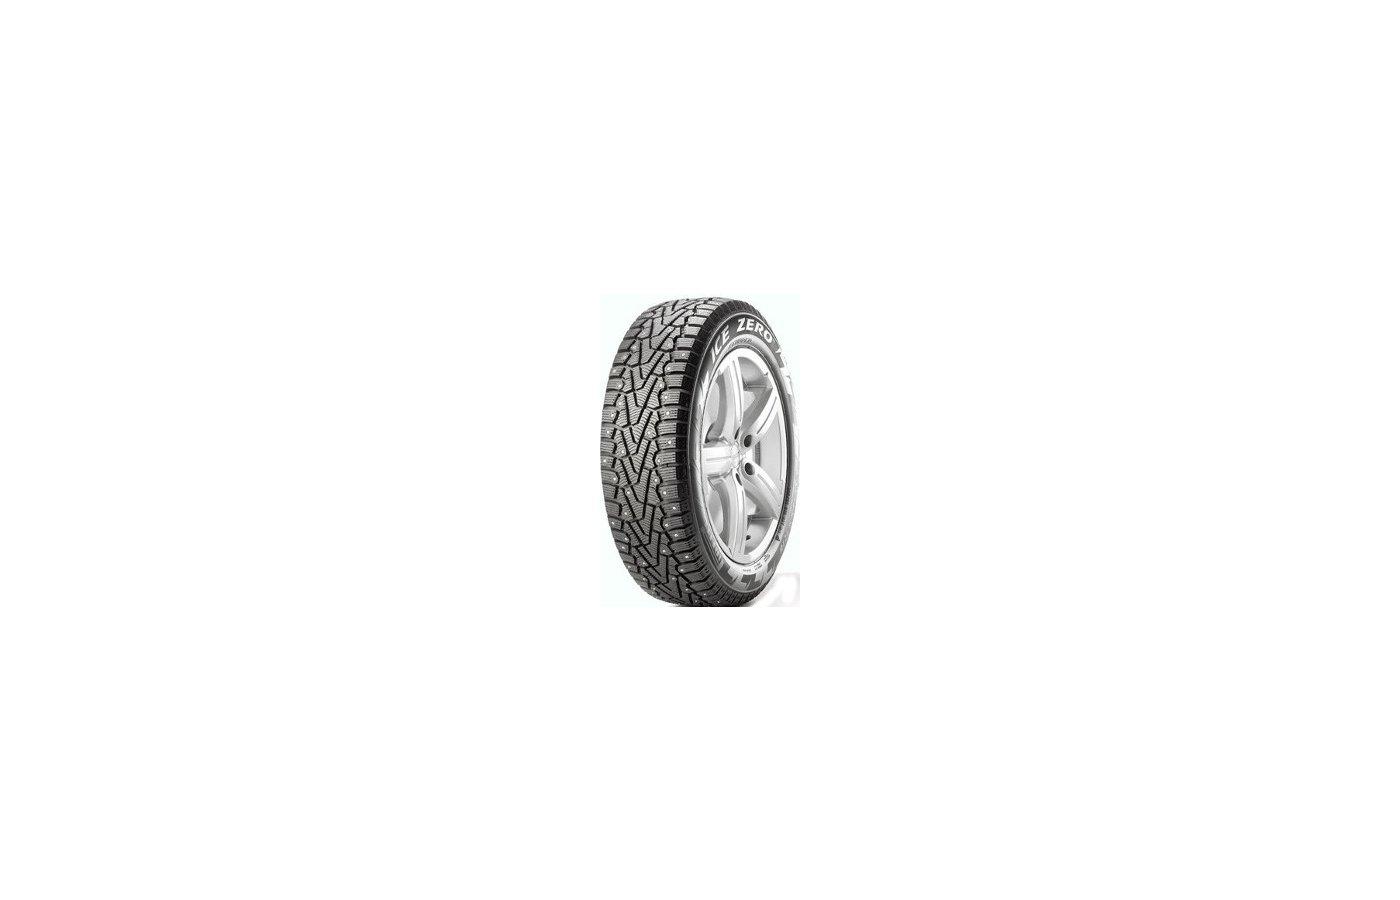 Шина Pirelli Winter Ice Zero 235/60 R18 TL 107H XL шип